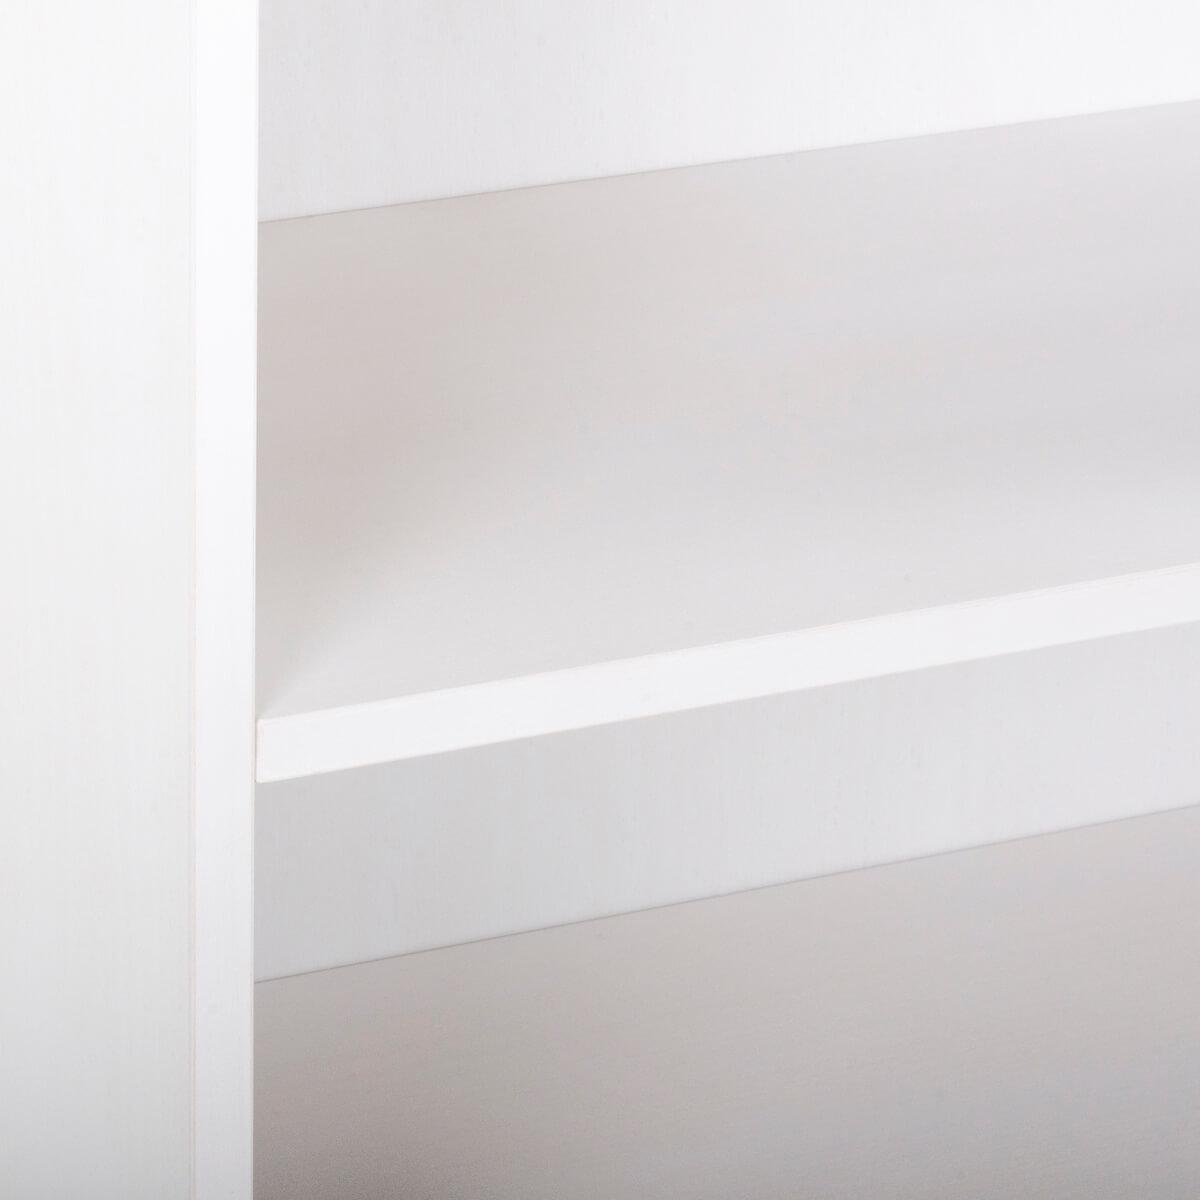 Regal H 95,3cm DELUXE De Breuyn weiß